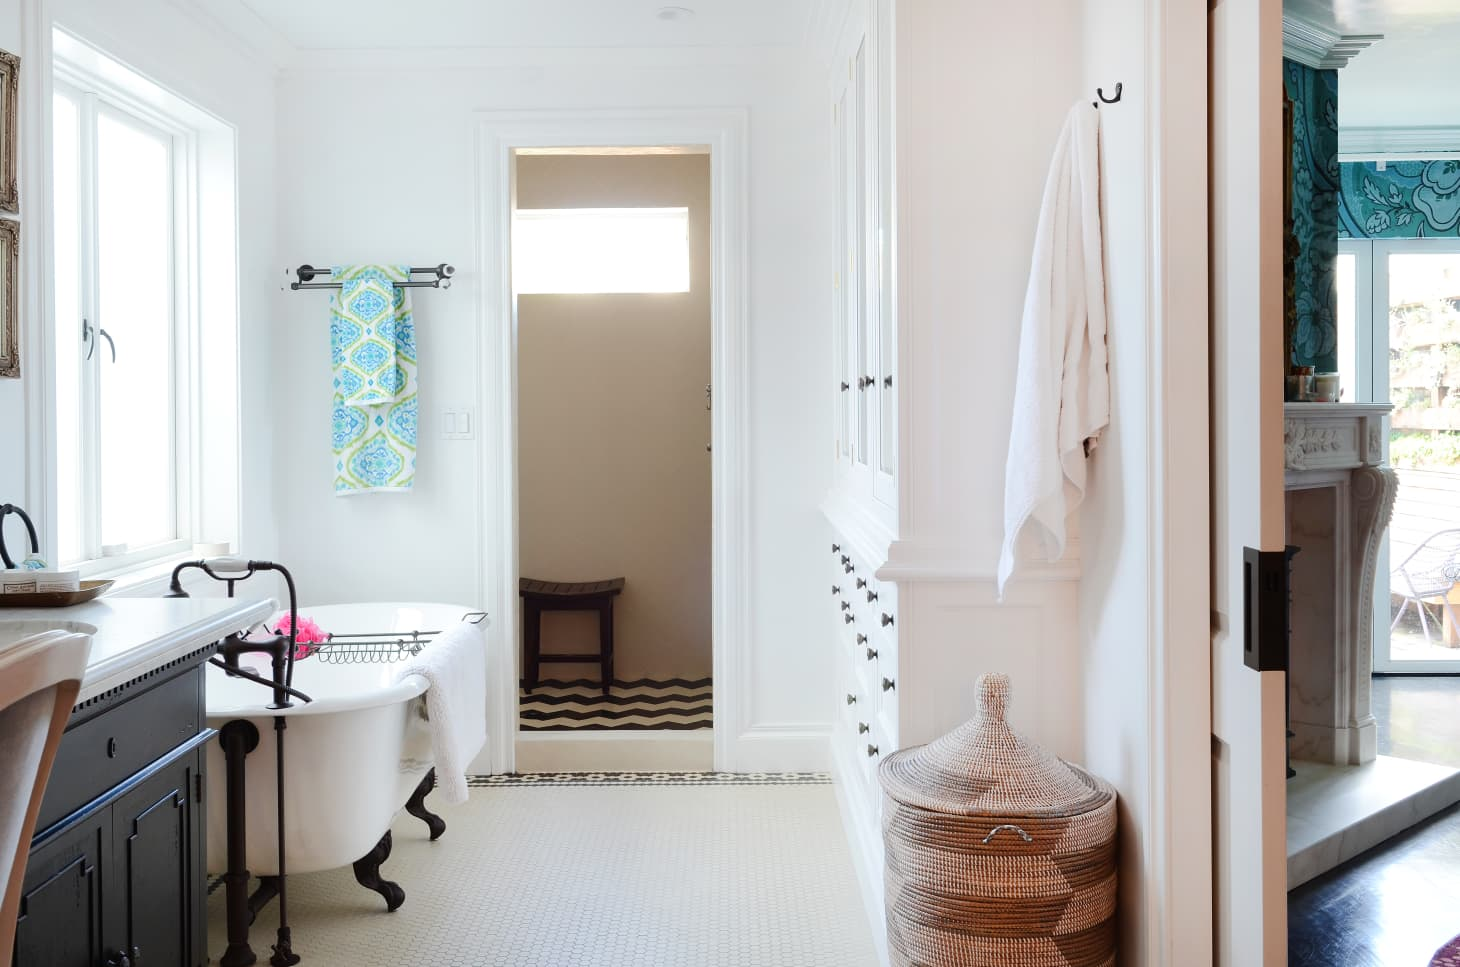 Apartment Therapy - 9 Savvy Ways to Fake a Bathroom Renovation